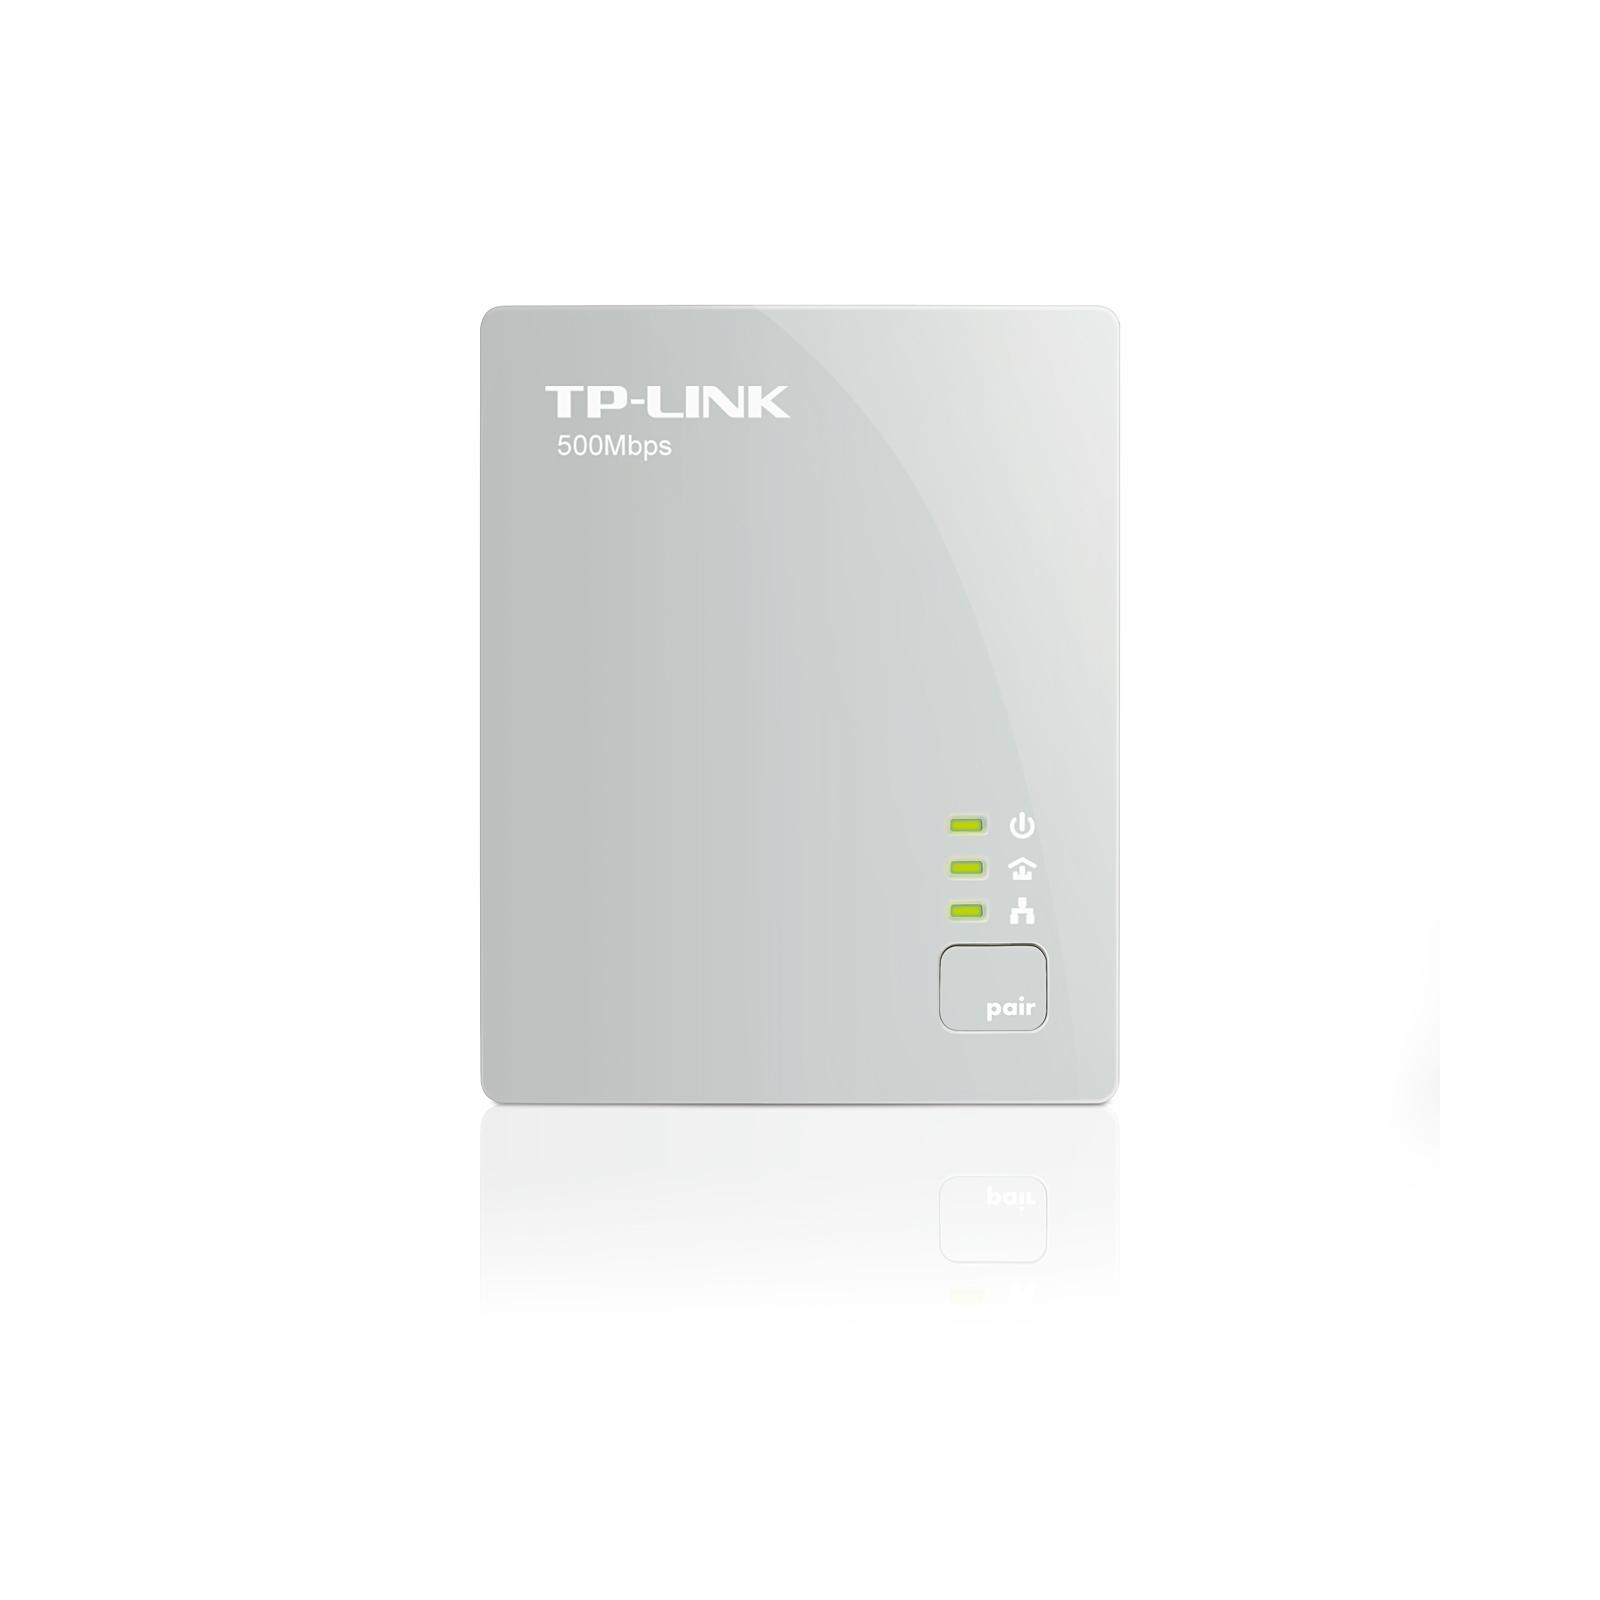 Адаптер Powerline TP-Link TL-PA4010 изображение 4